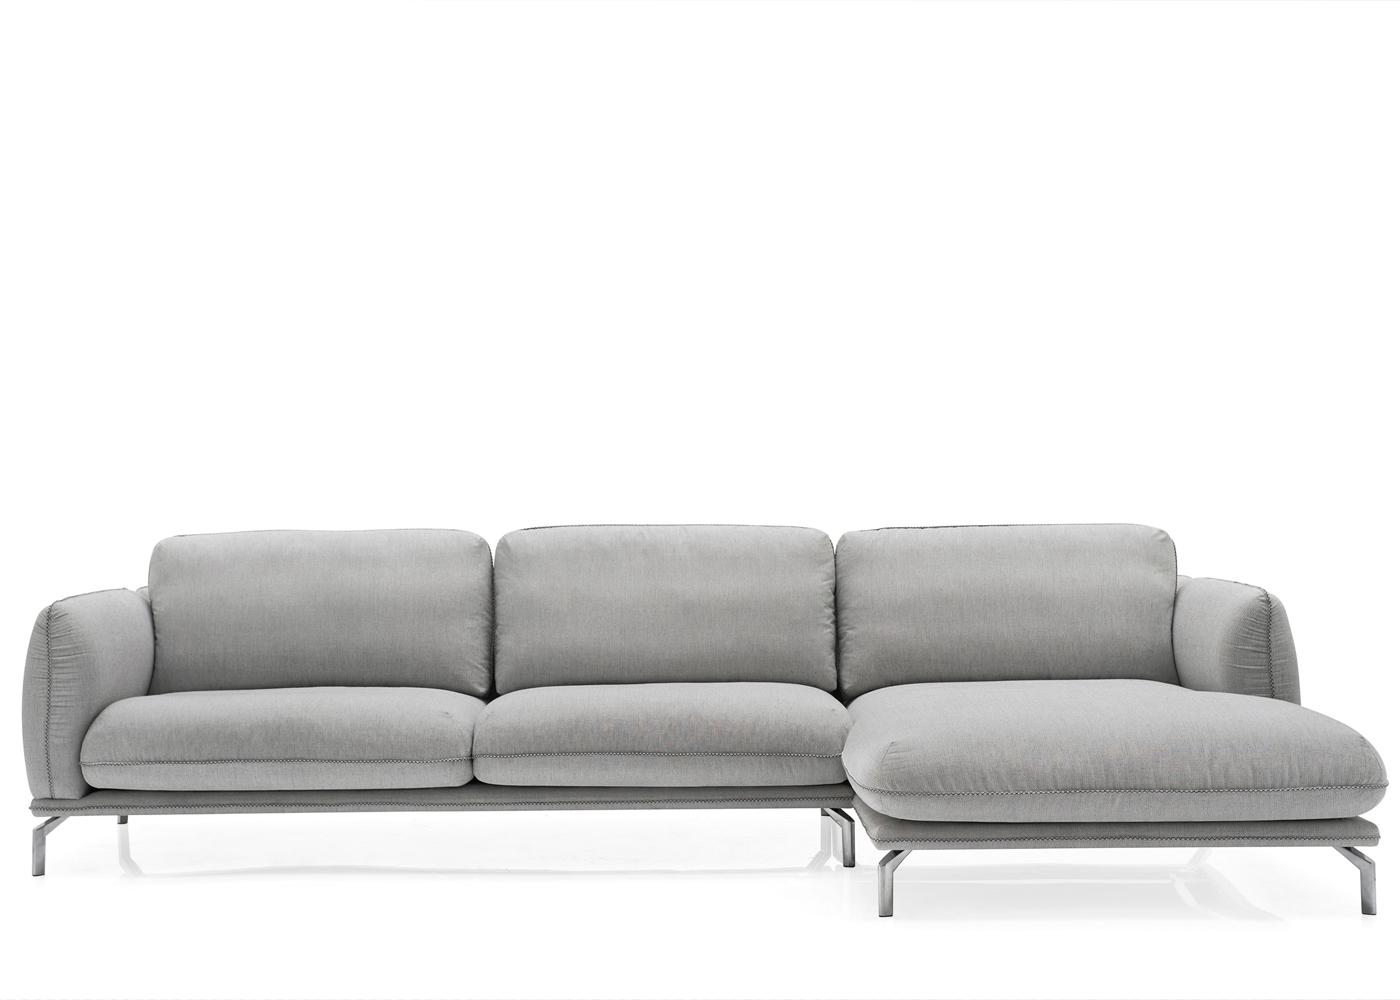 calligaris sofas uk sofa guard dog taylor midfurn furniture superstore